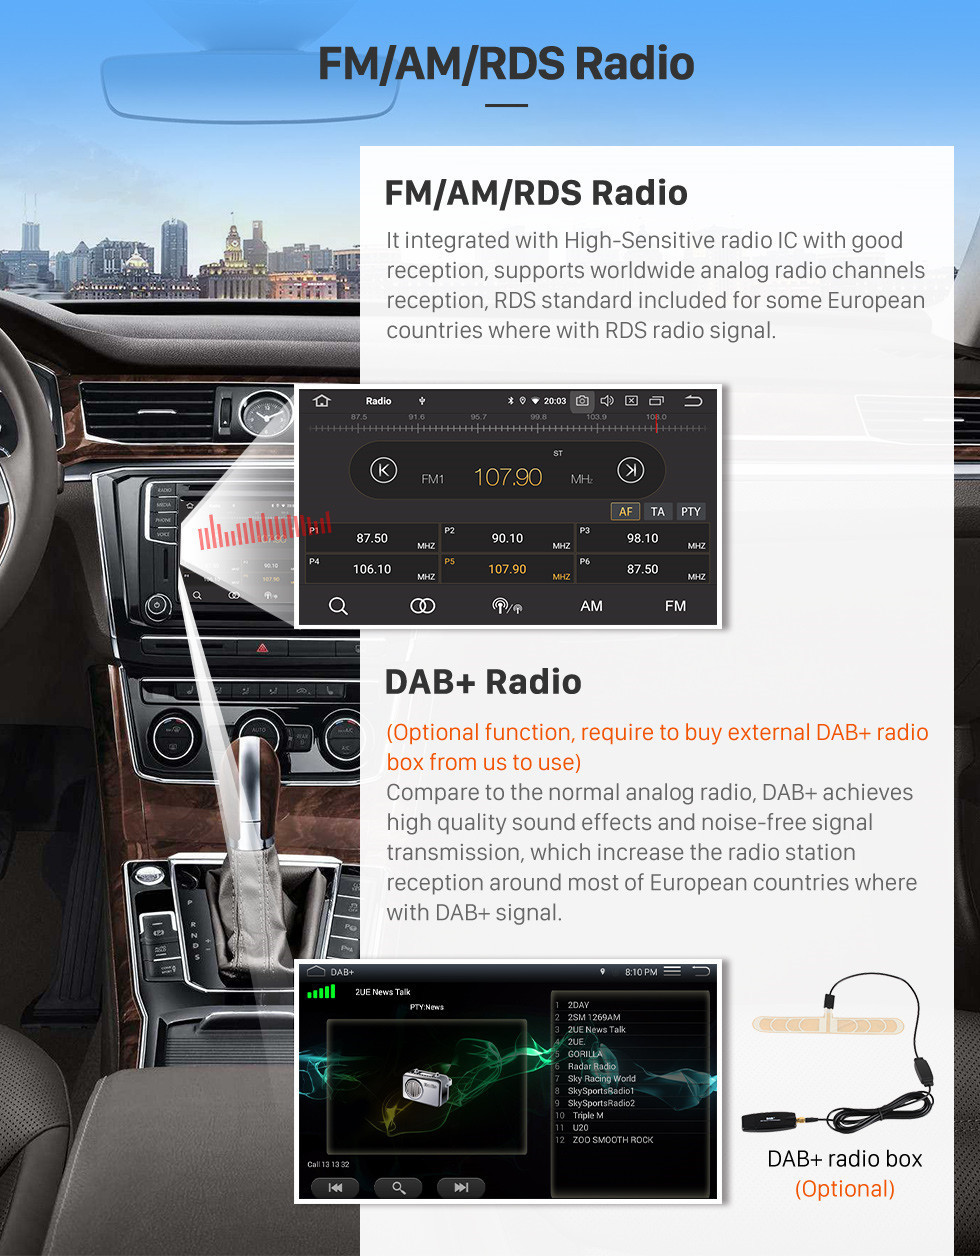 Seicane 10.1 inch Android 10.0 Radio for 2017-2019 Kia Cerato Auto A/C Bluetooth Wifi HD Touchscreen GPS Navigation Carplay USB support DVR OBD2 Rearview camera